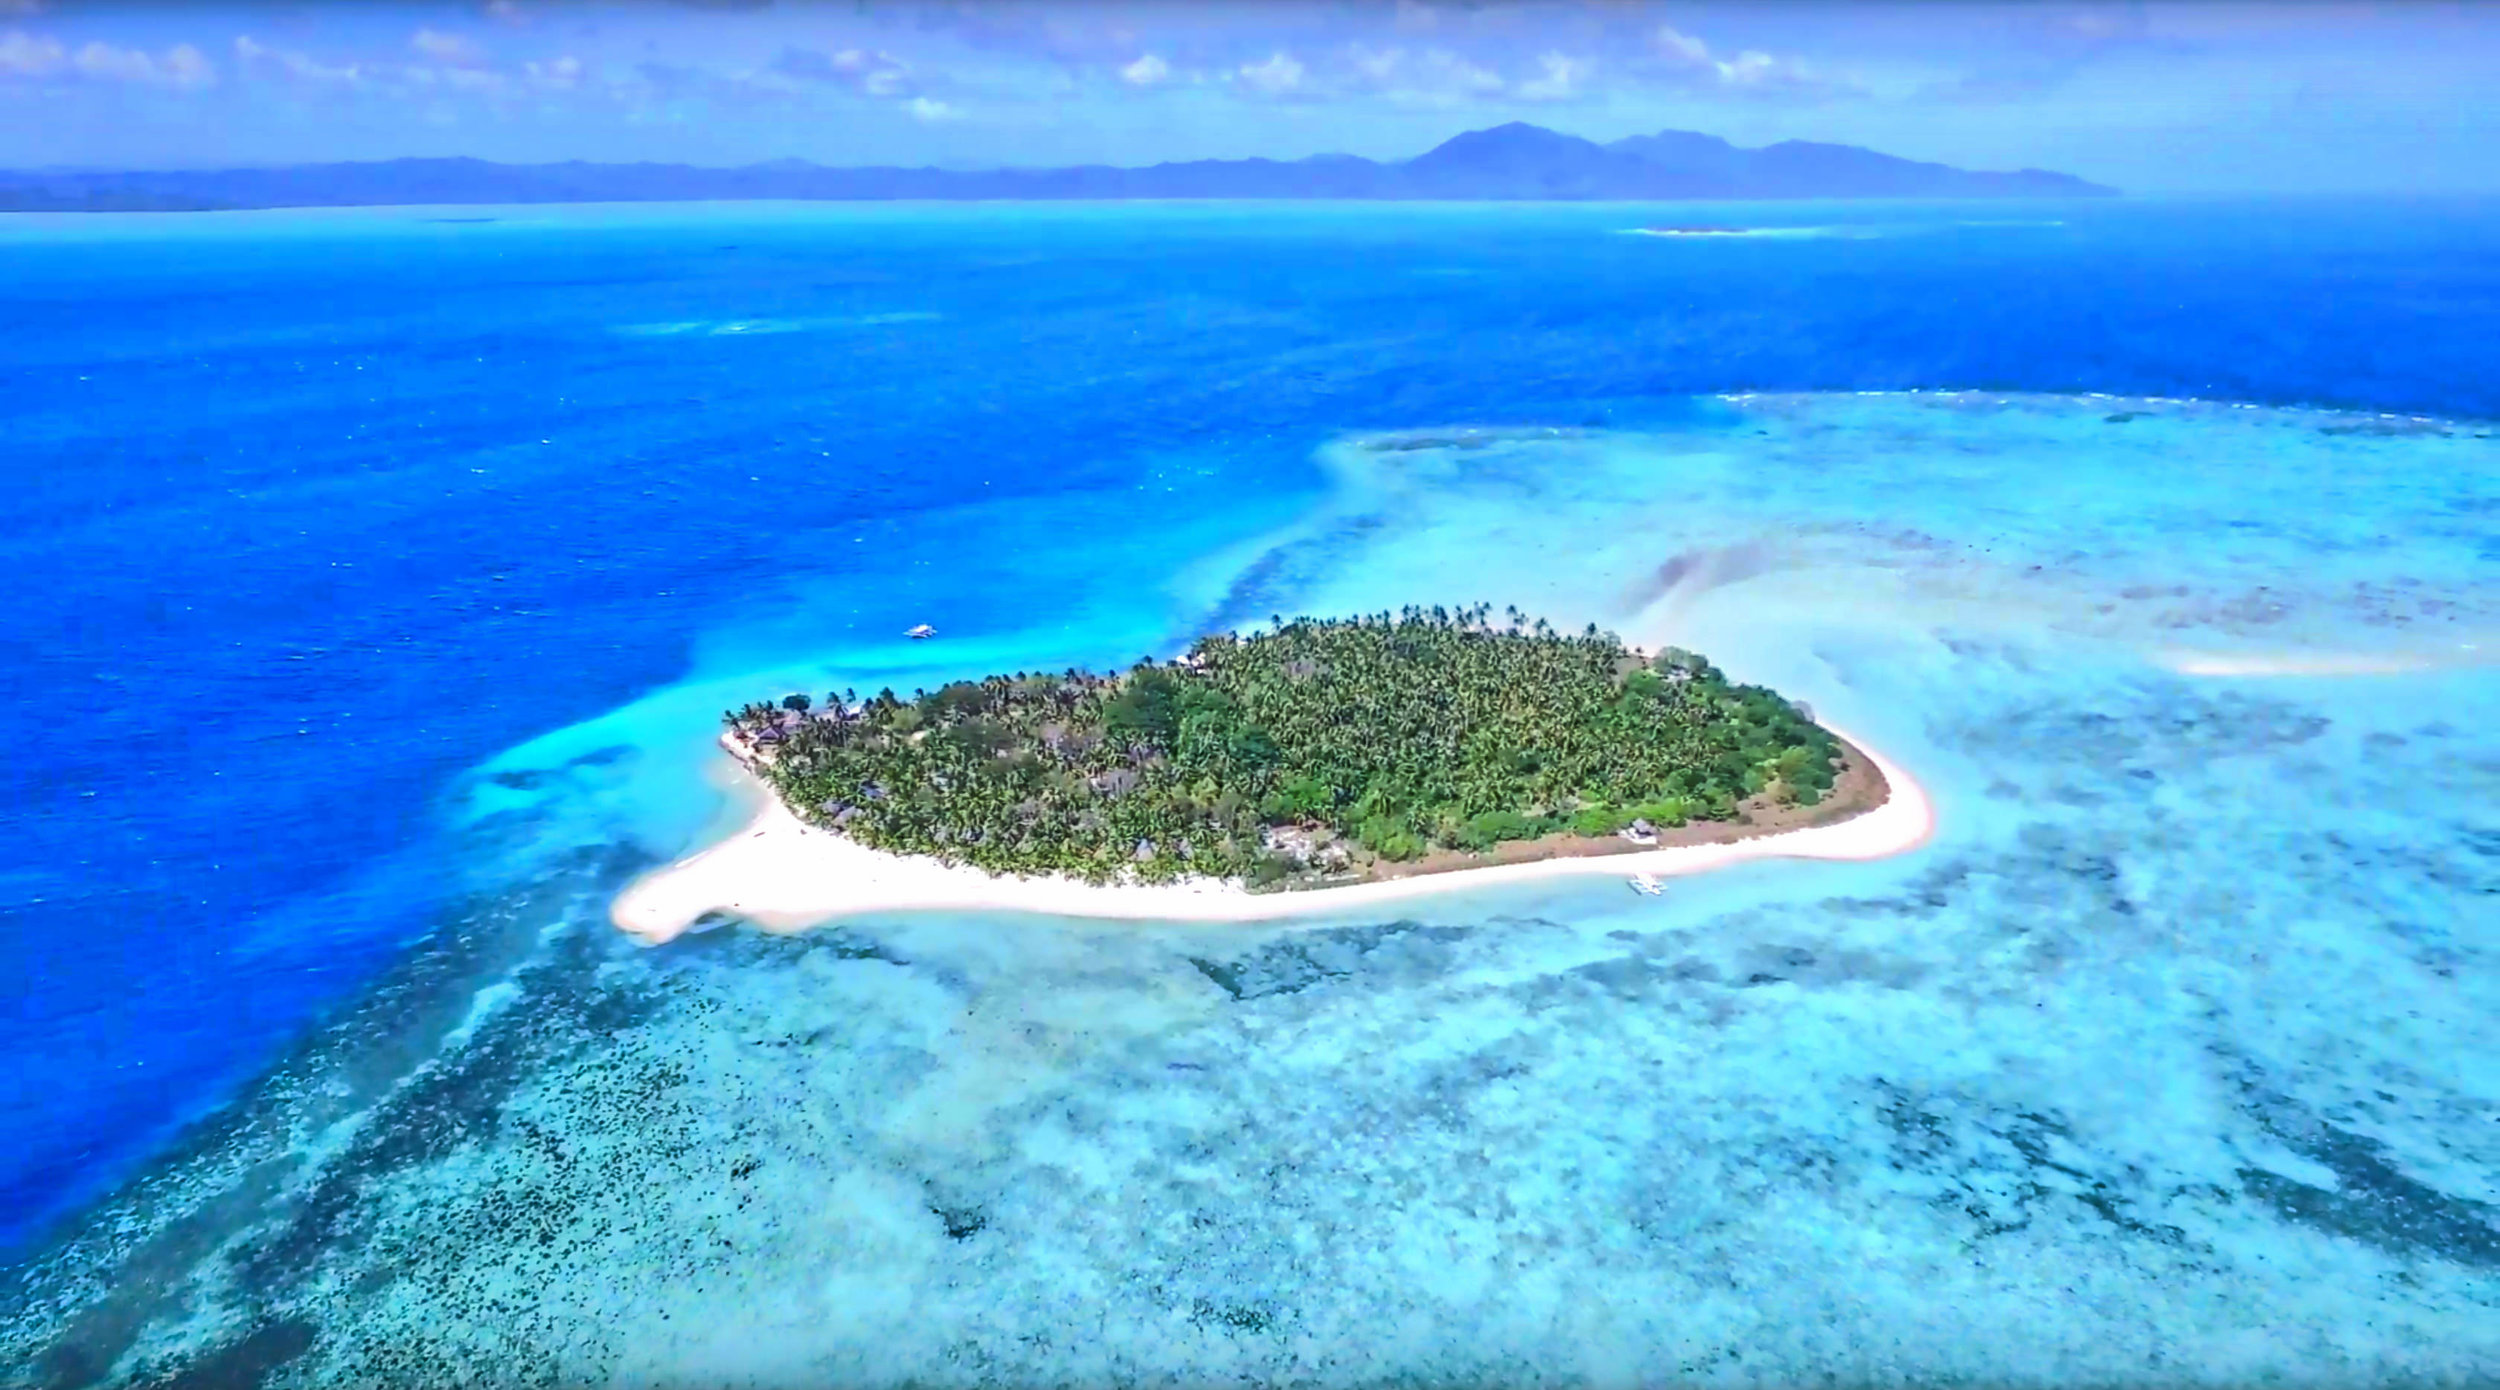 Modessa-Island-Palawan-Aerial-Tour-Project-LUPAD-JPG.jpg